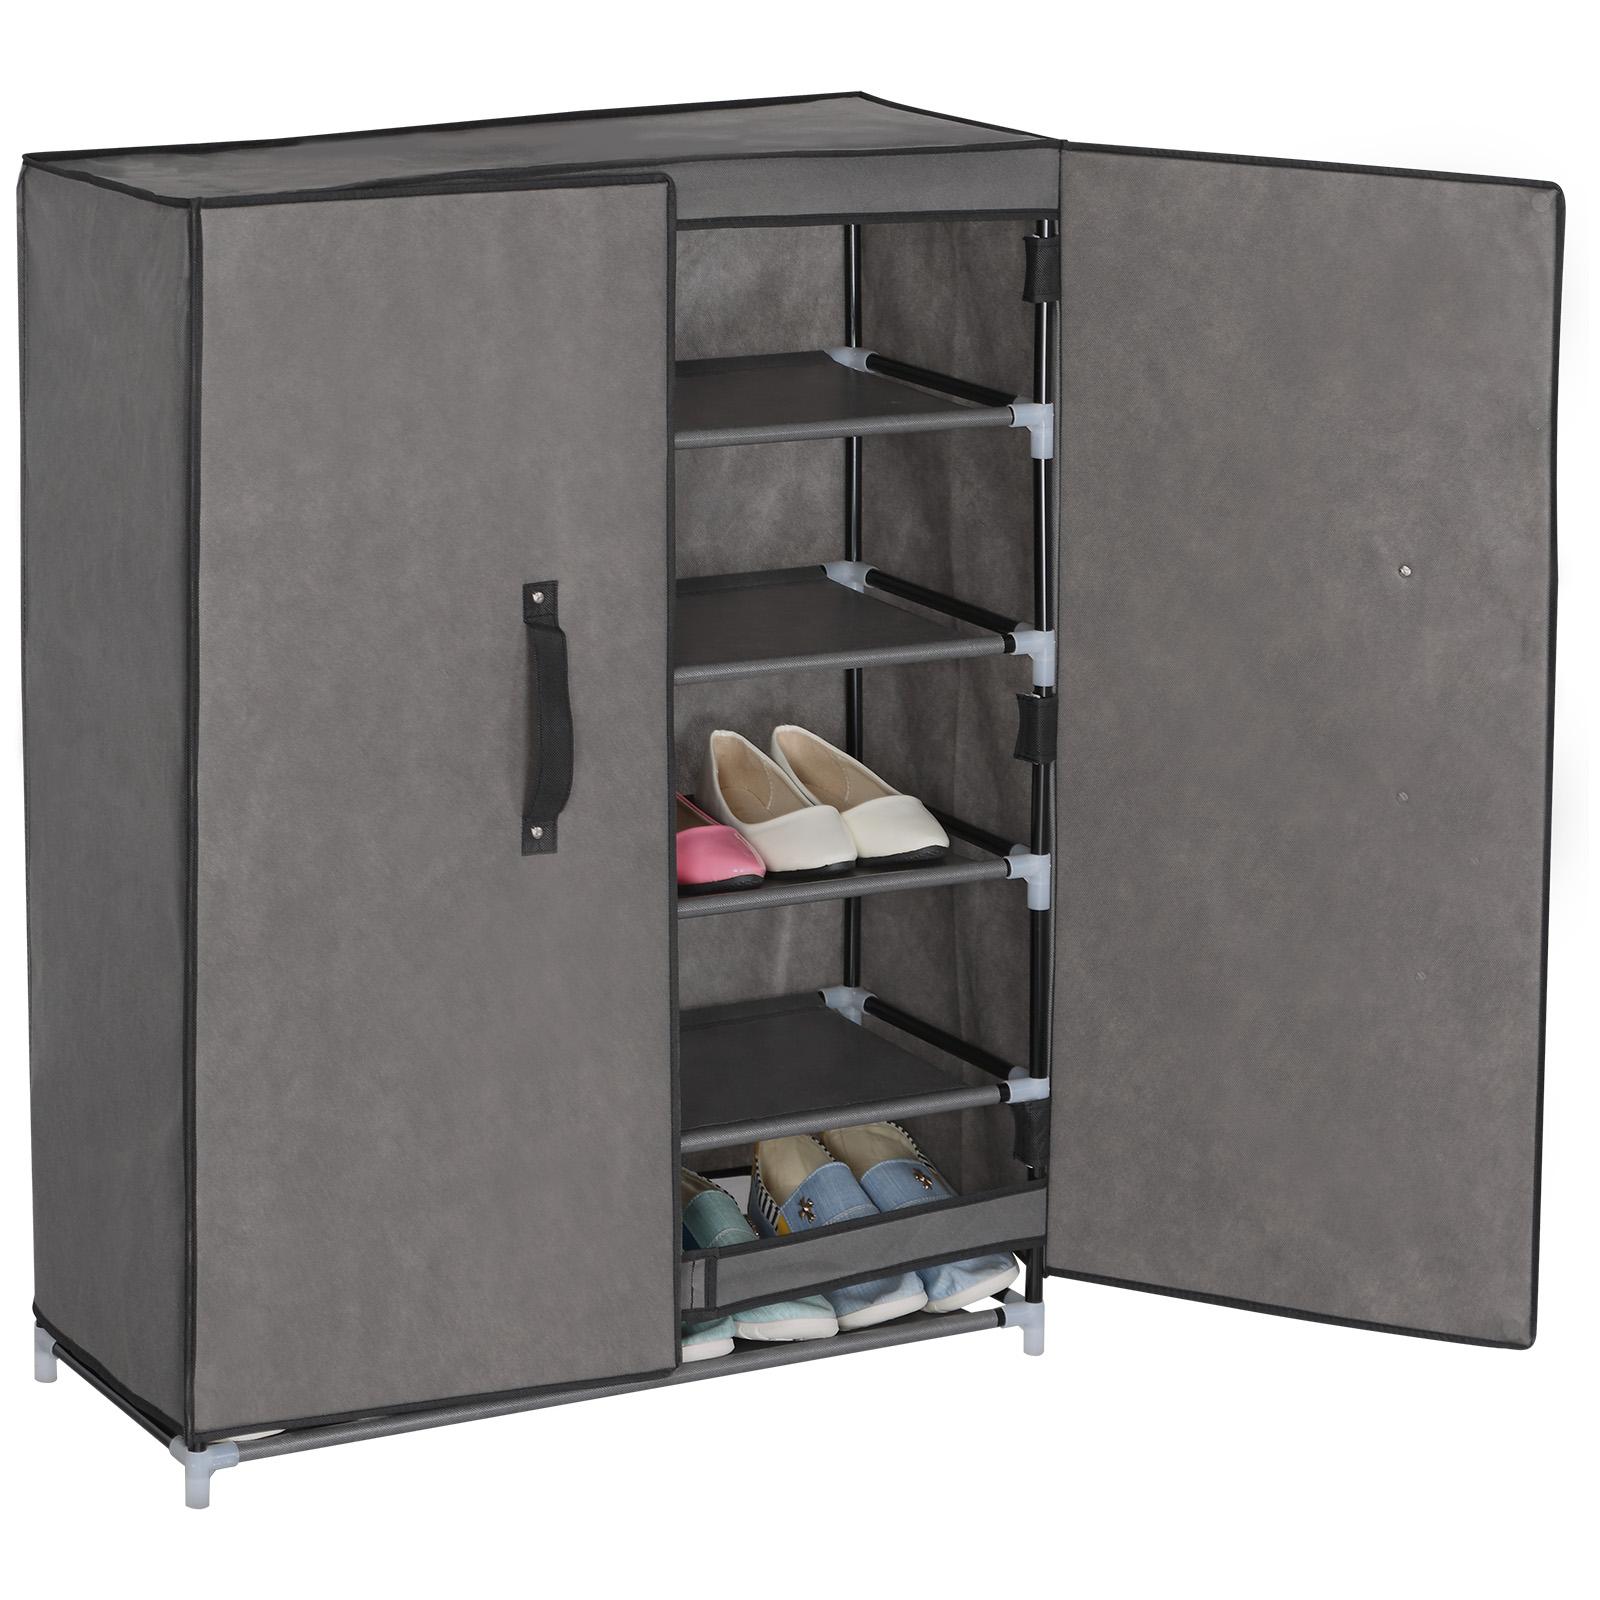 schuhschrank faltschrank schuhregal schuhst nder badregal stoff regal xxl 172. Black Bedroom Furniture Sets. Home Design Ideas